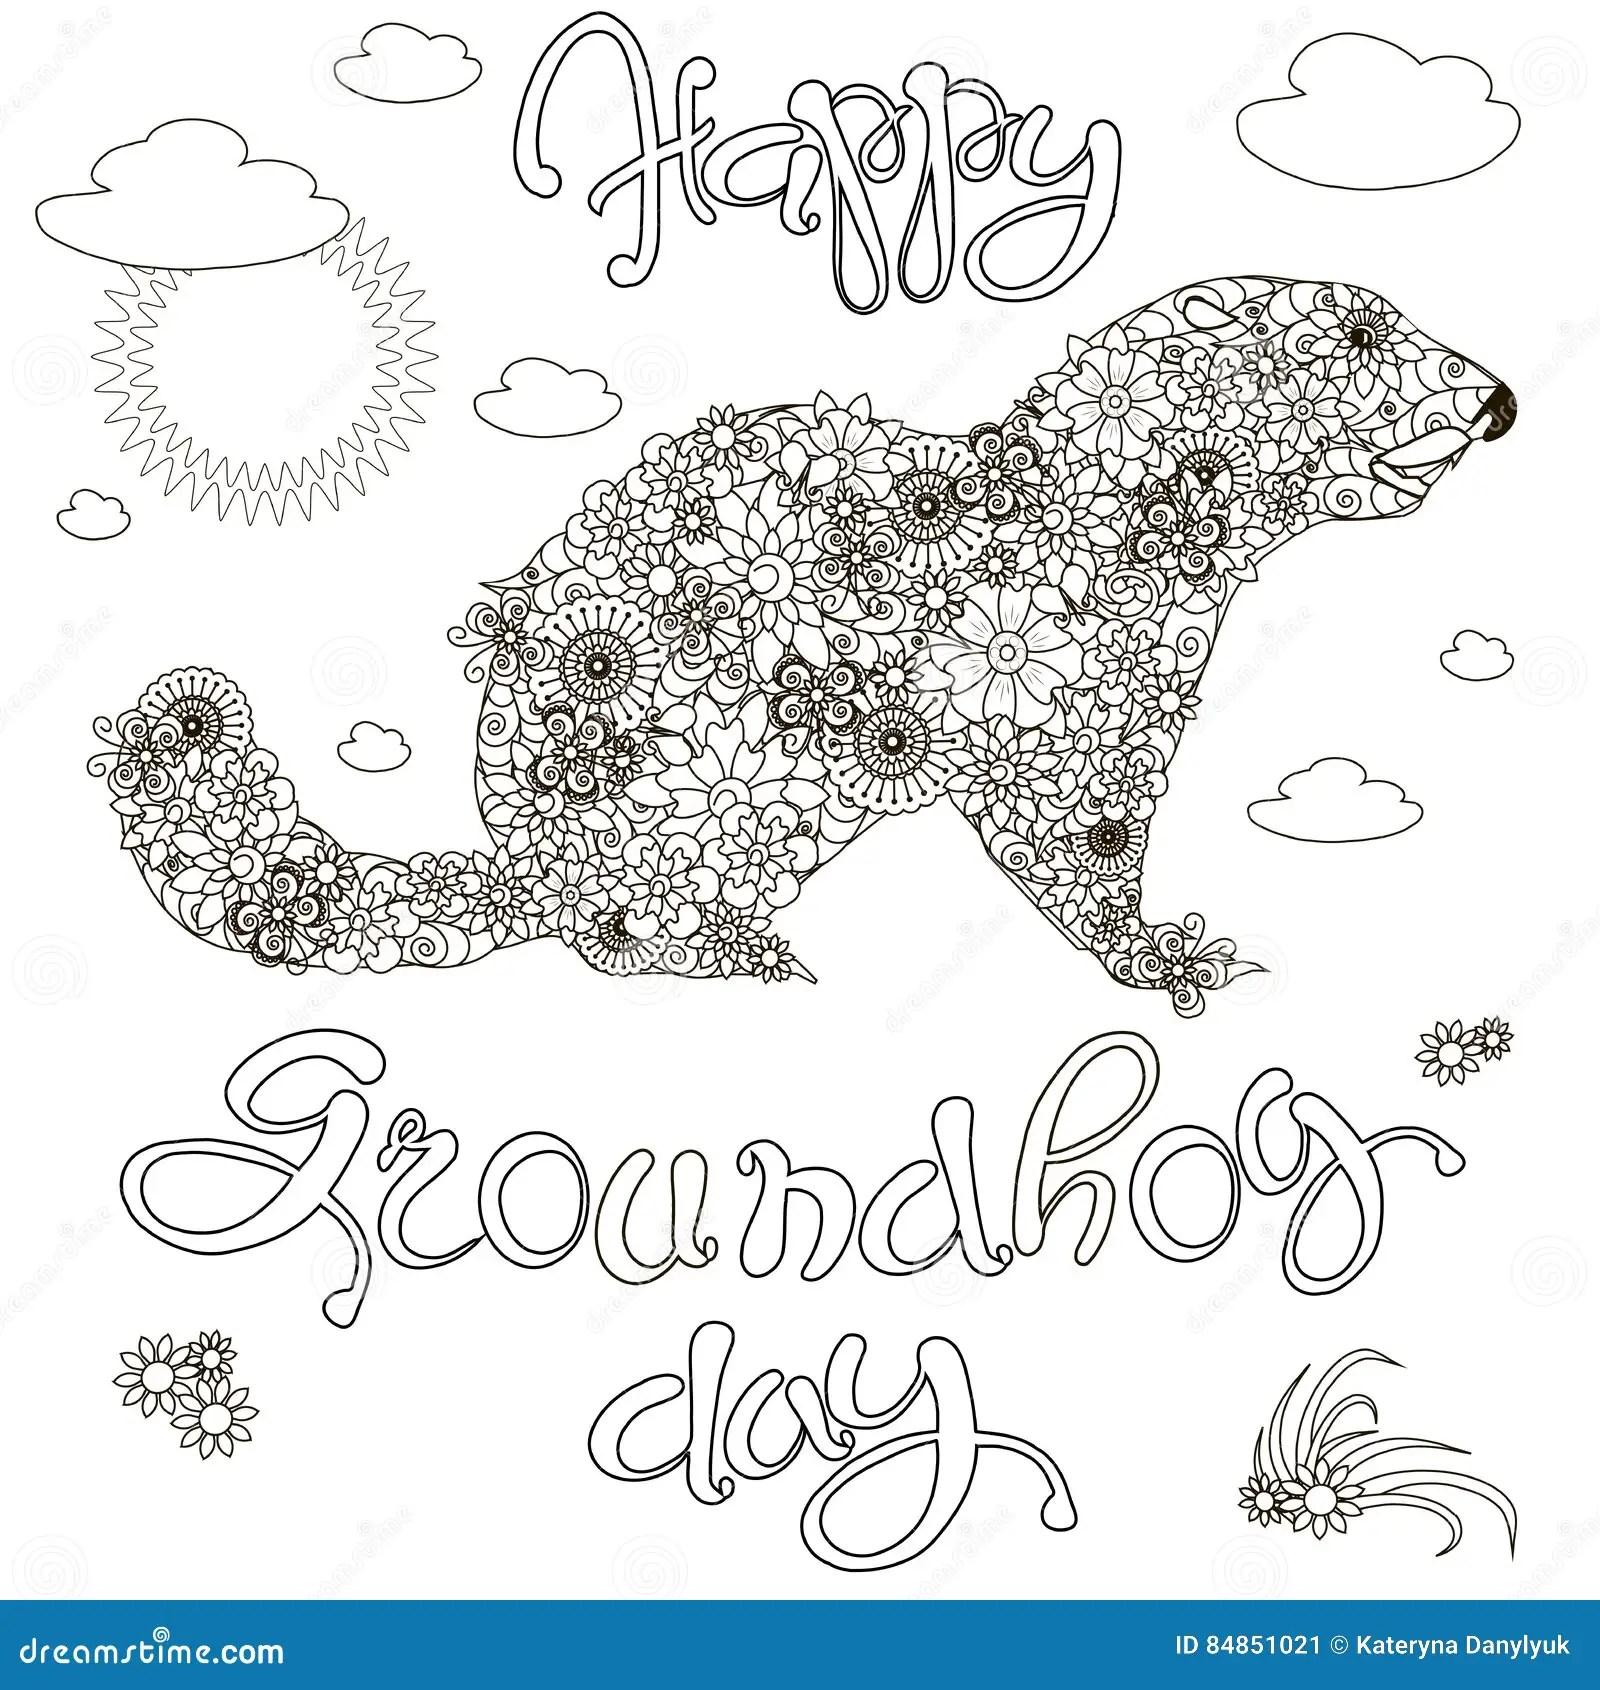 Sketch Of Banner Happy Groundhog Day Floral Groundhog